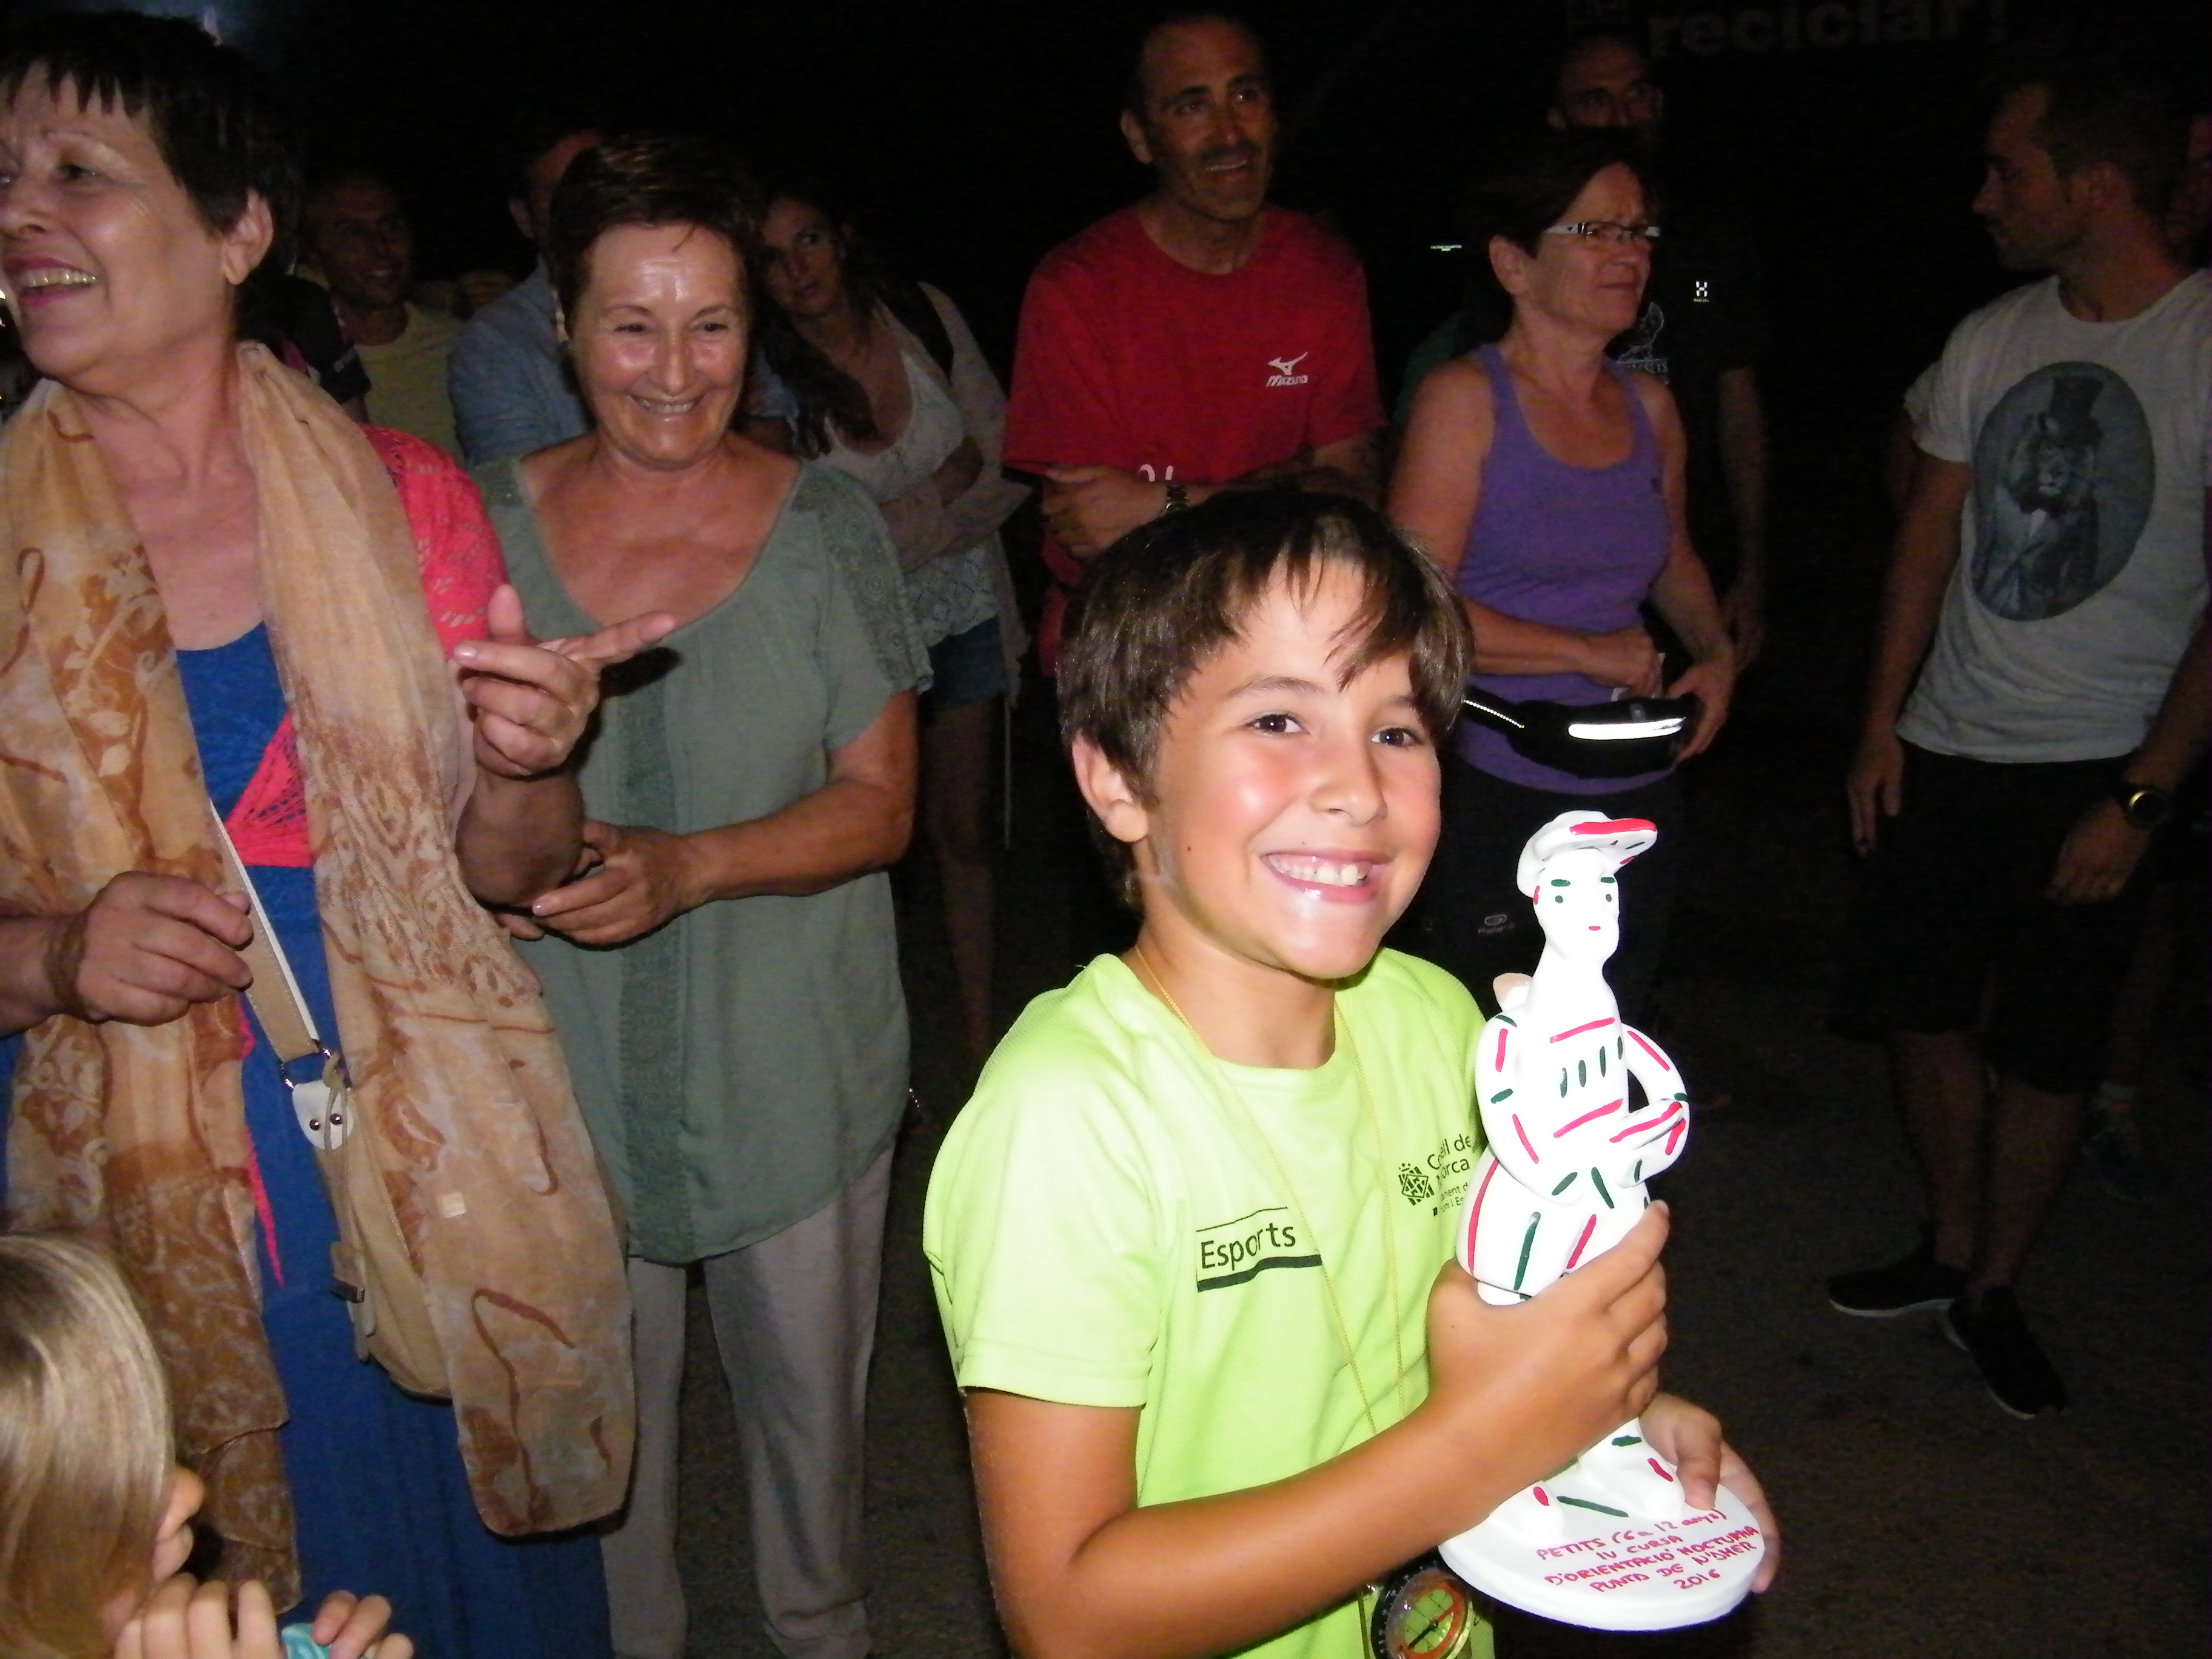 Guanyador infantgil Foto Festes sa Coma 23 -07-2016 003